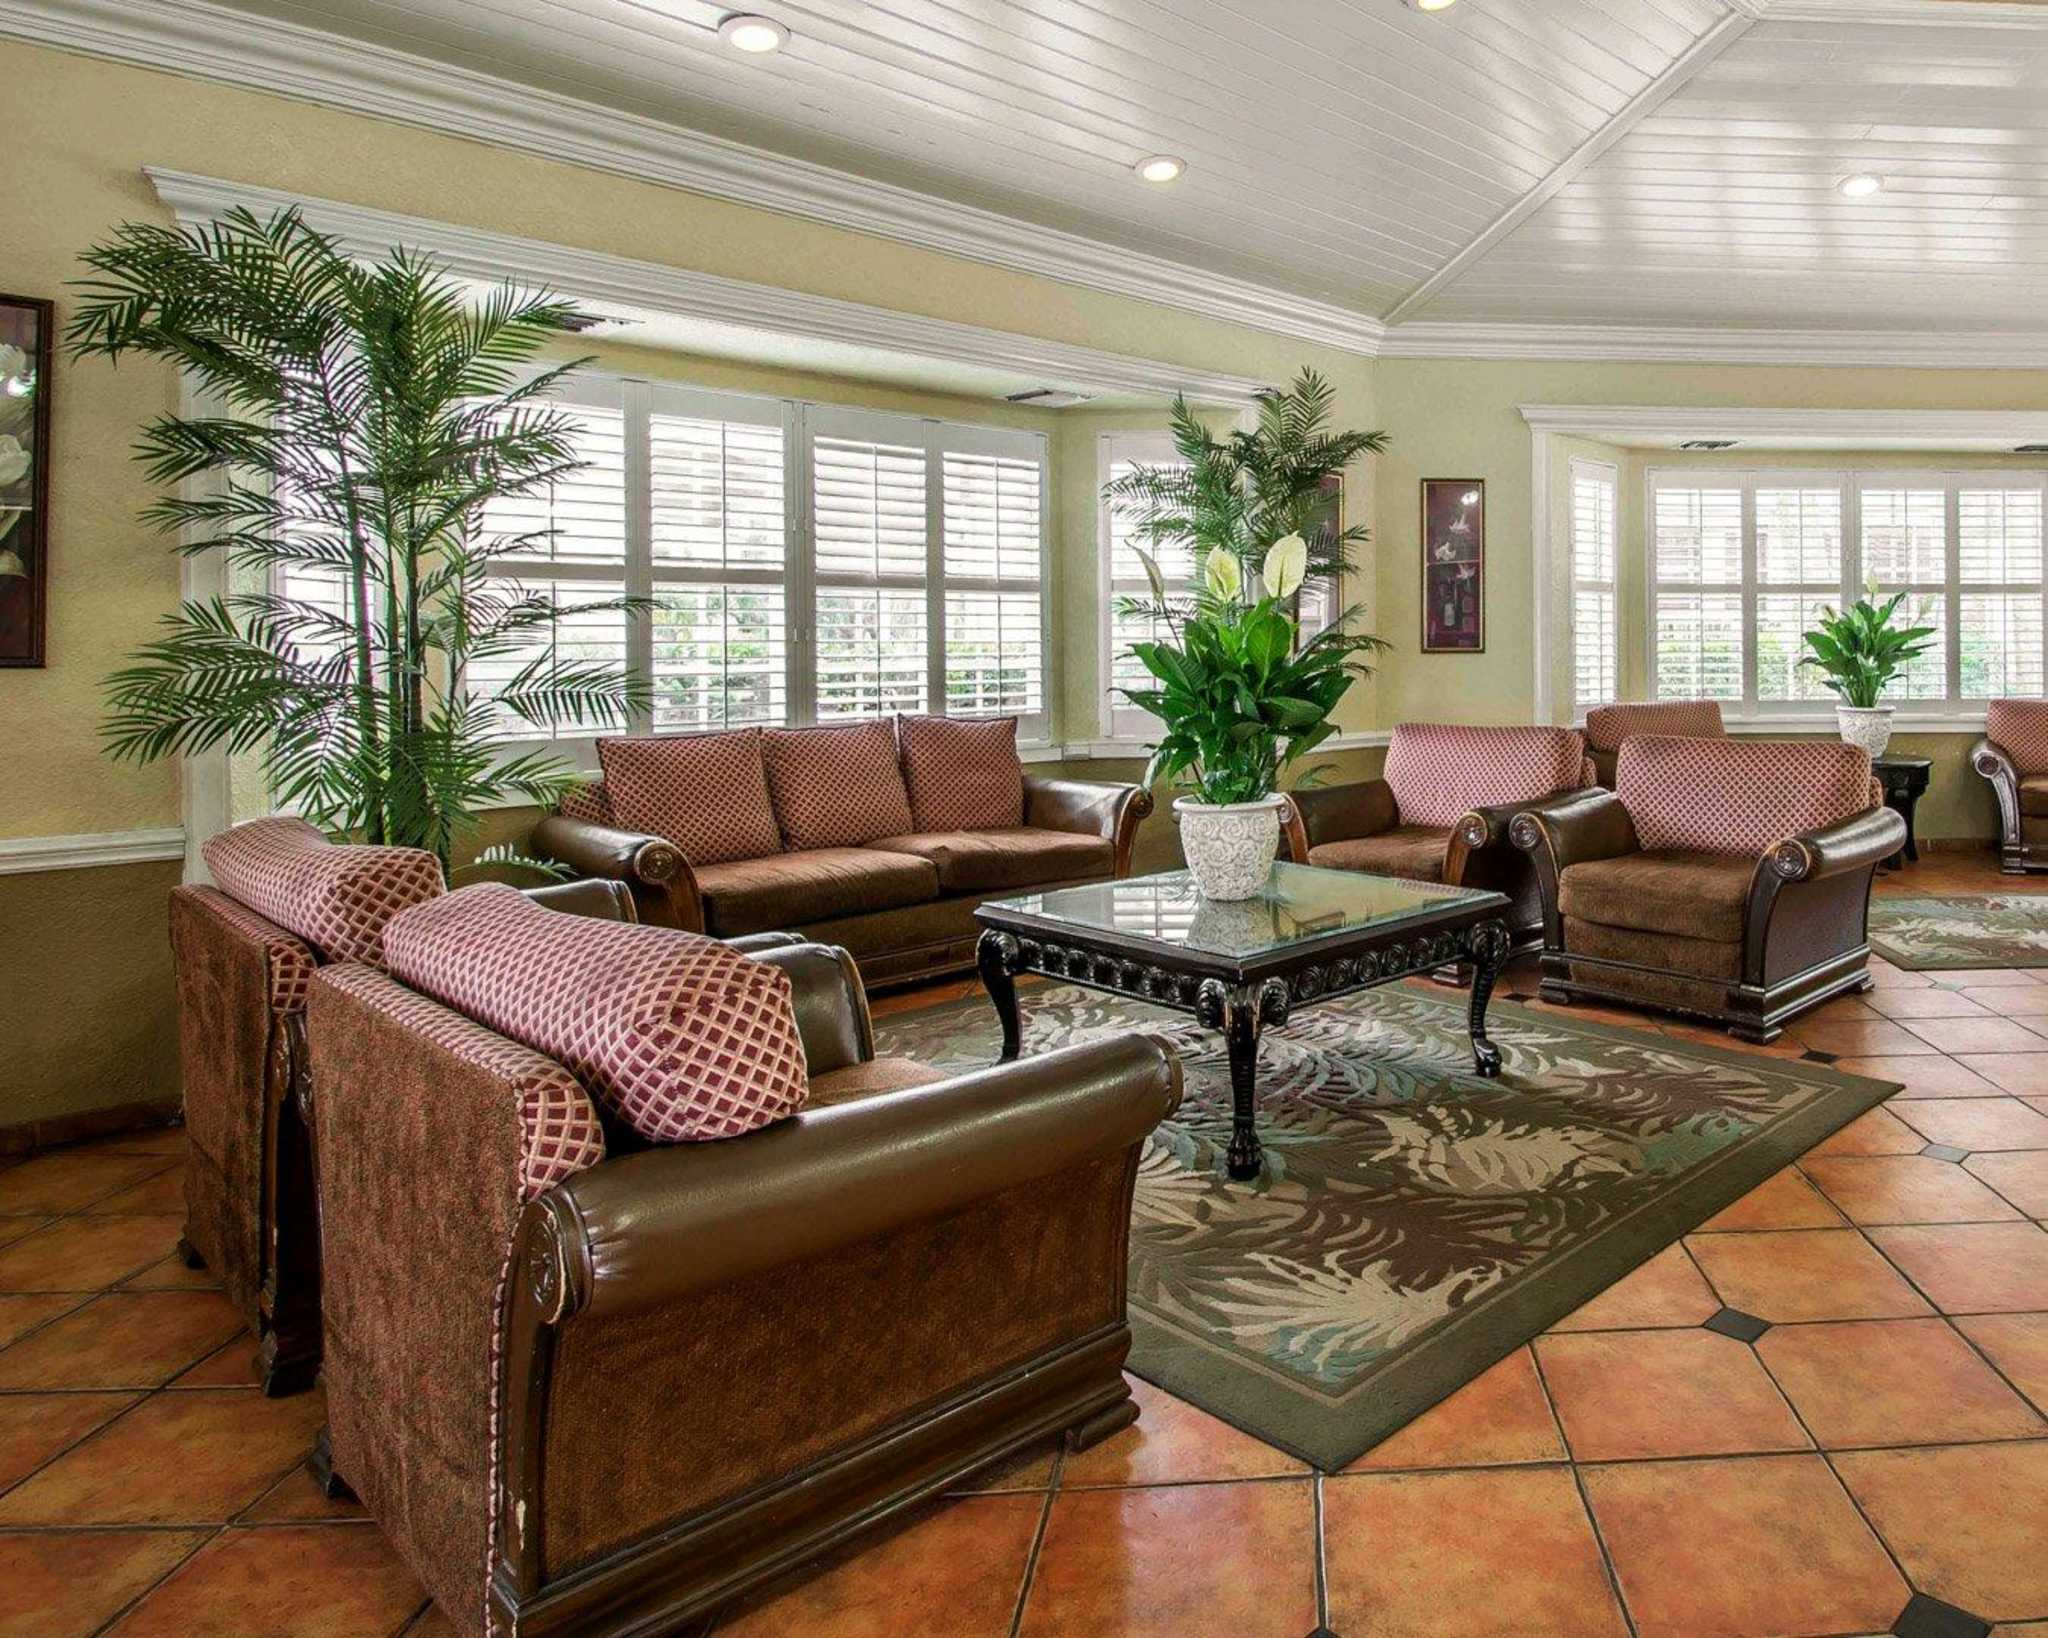 Comfort Inn Fort Lauderdale Airport Cruise Port South.Quality Inn ...